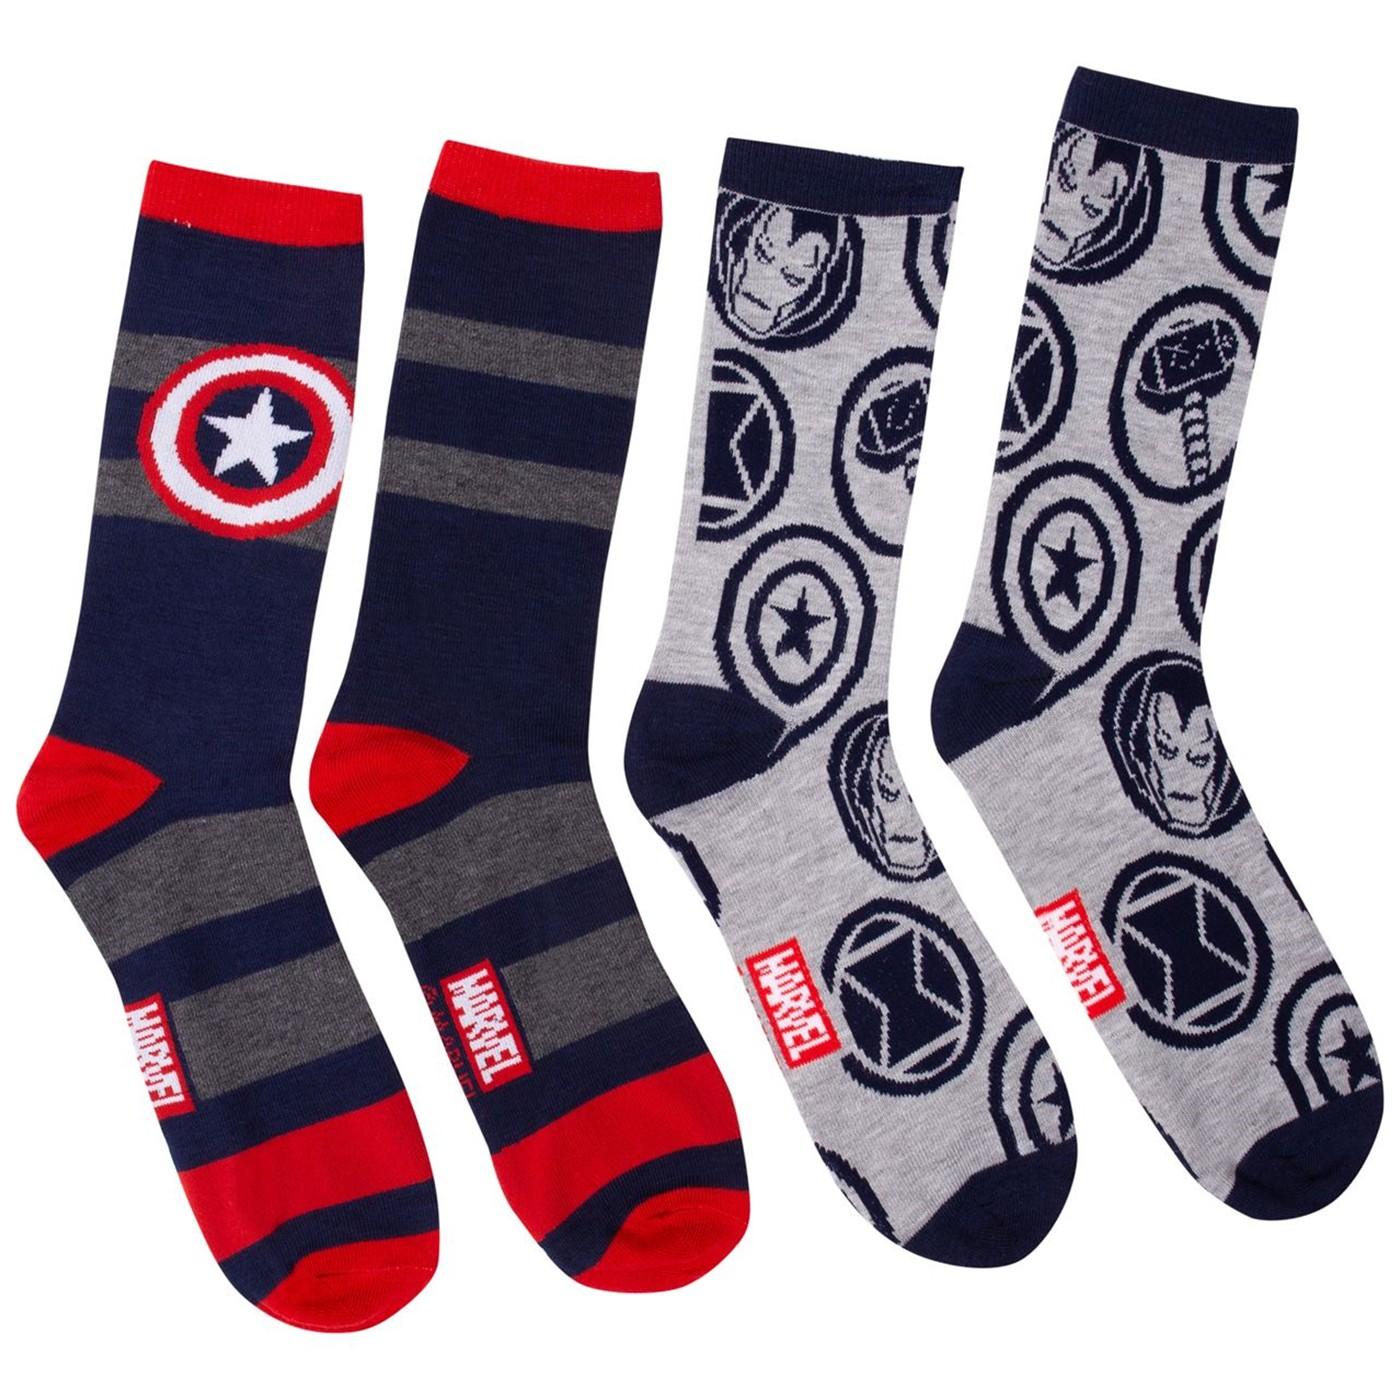 Captain America Symbol and Avengers Symbols Crew Socks Two Pack